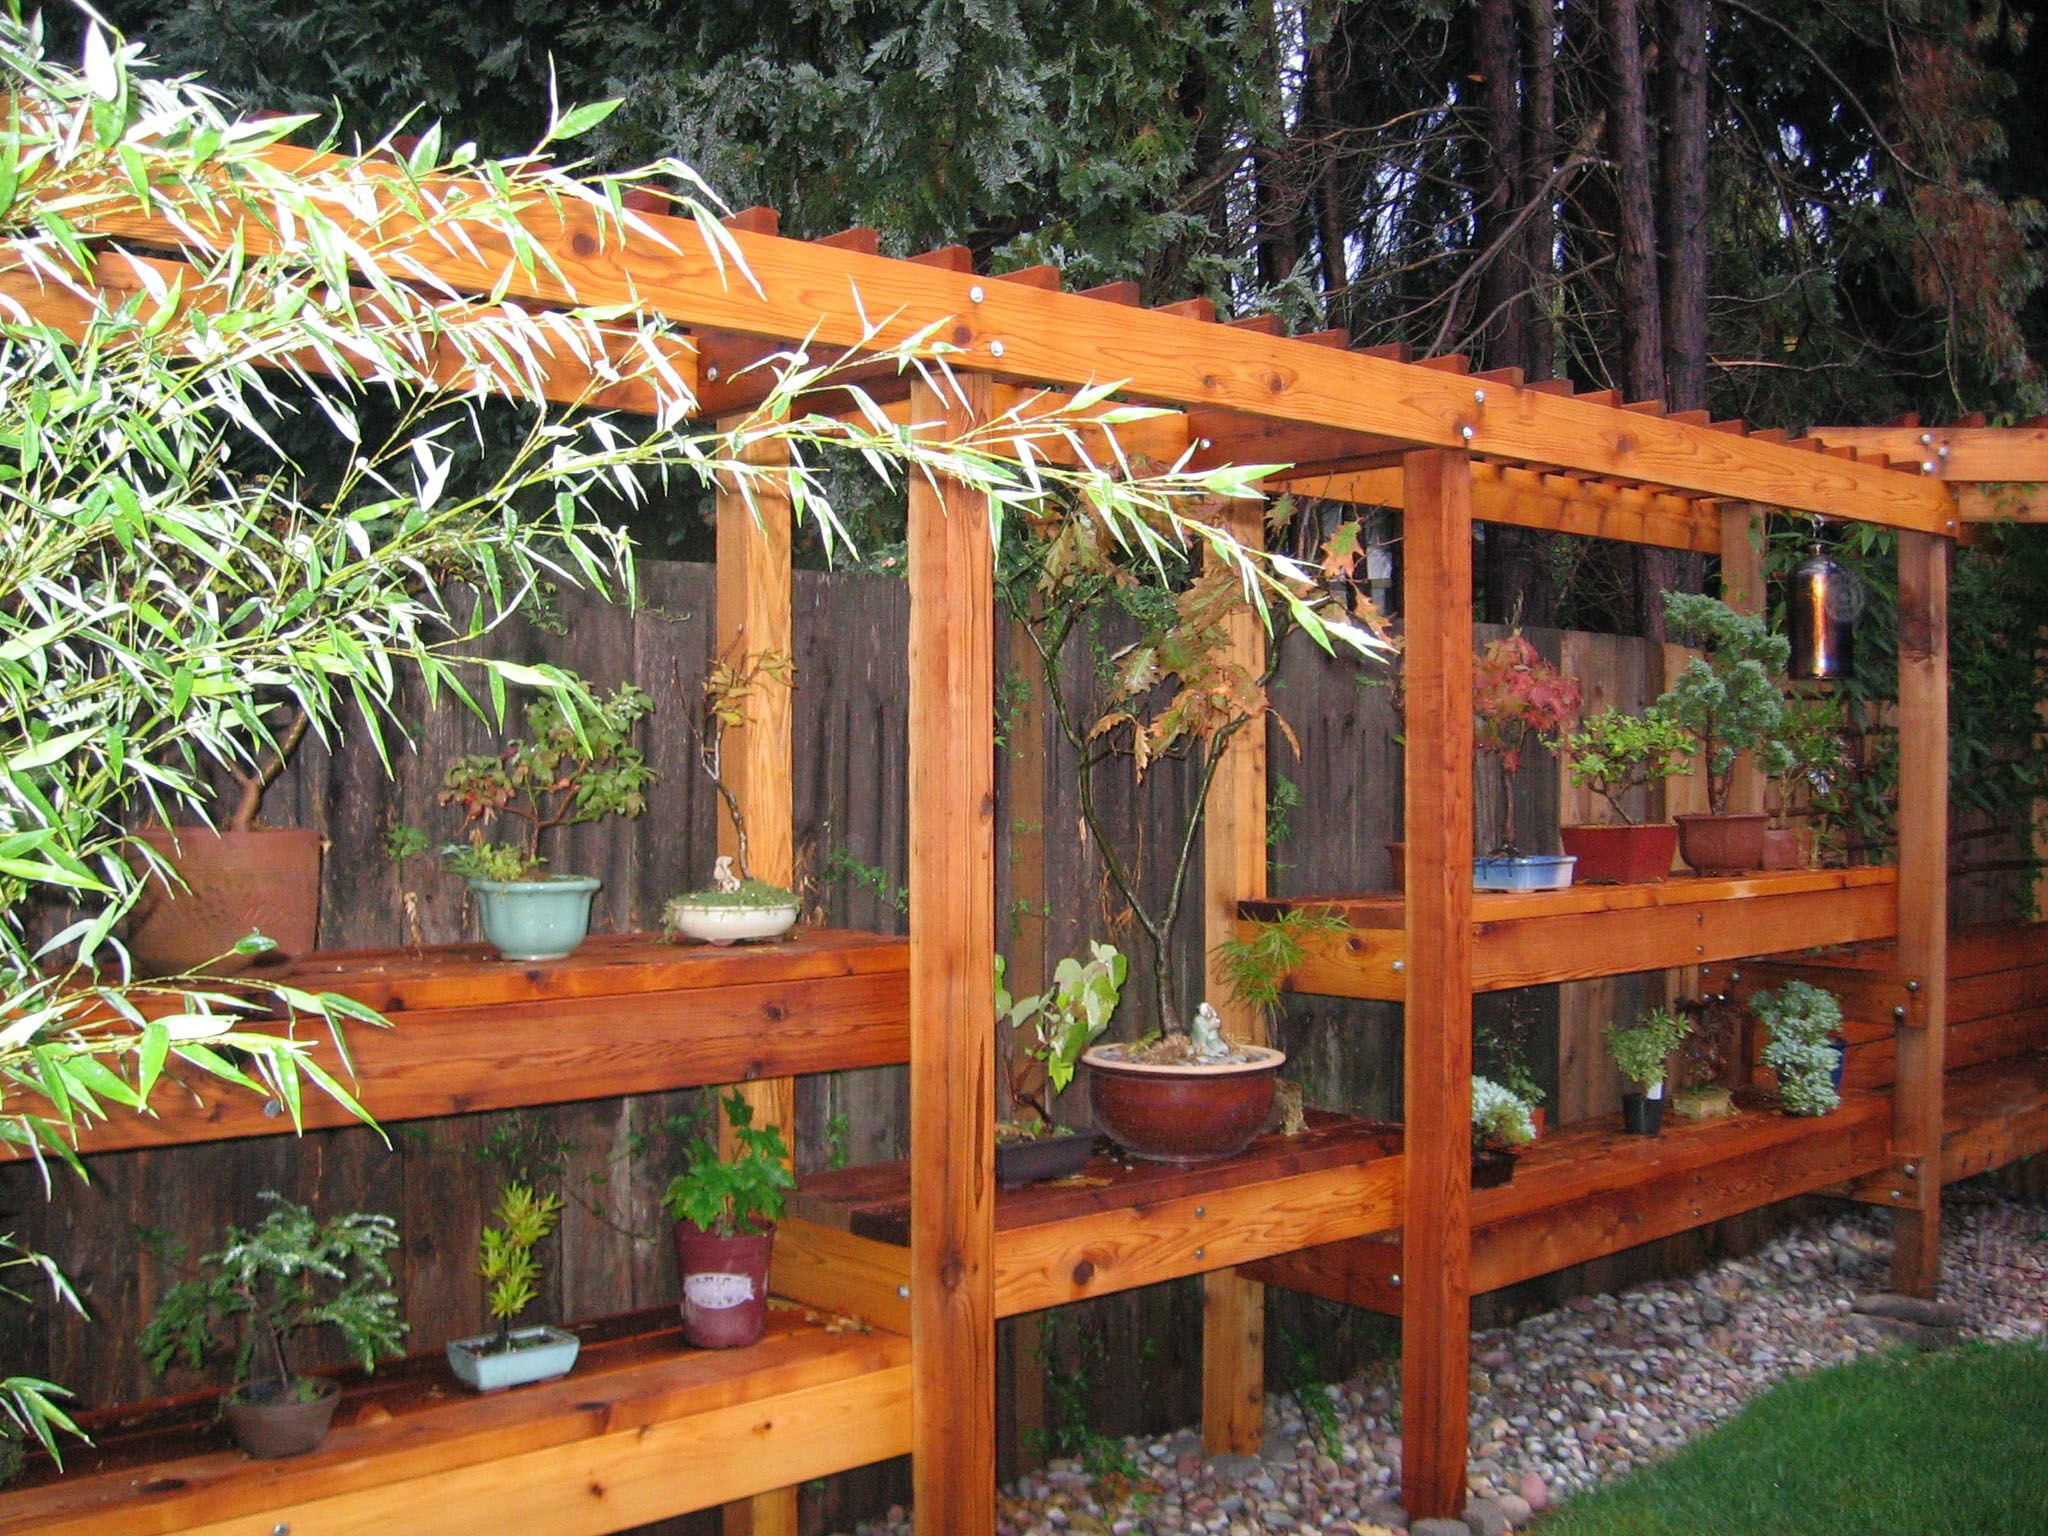 Bonsai Shelves And Corner Bench My Ideal Garden Bonsai